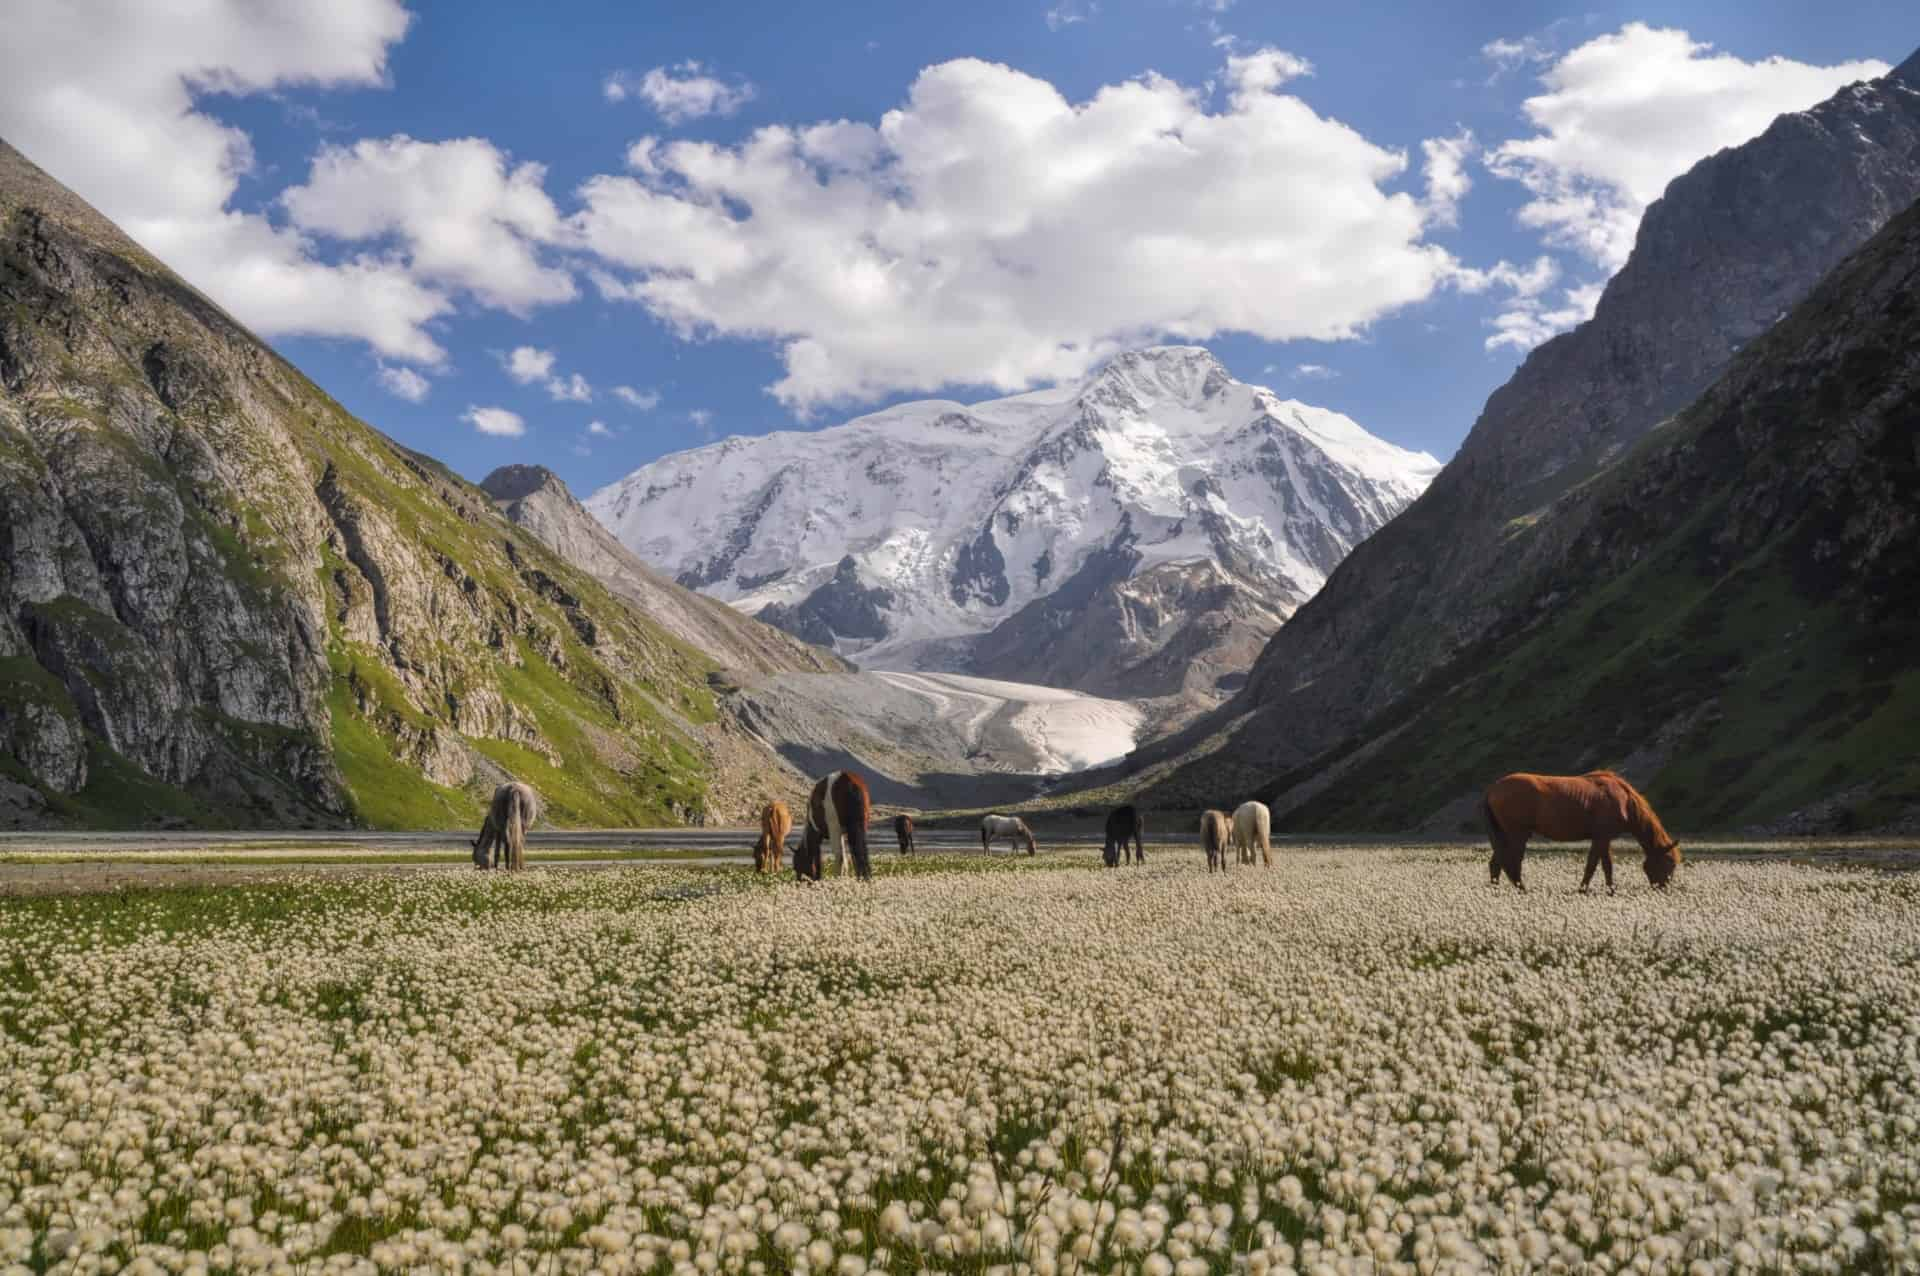 Kyrygzstan